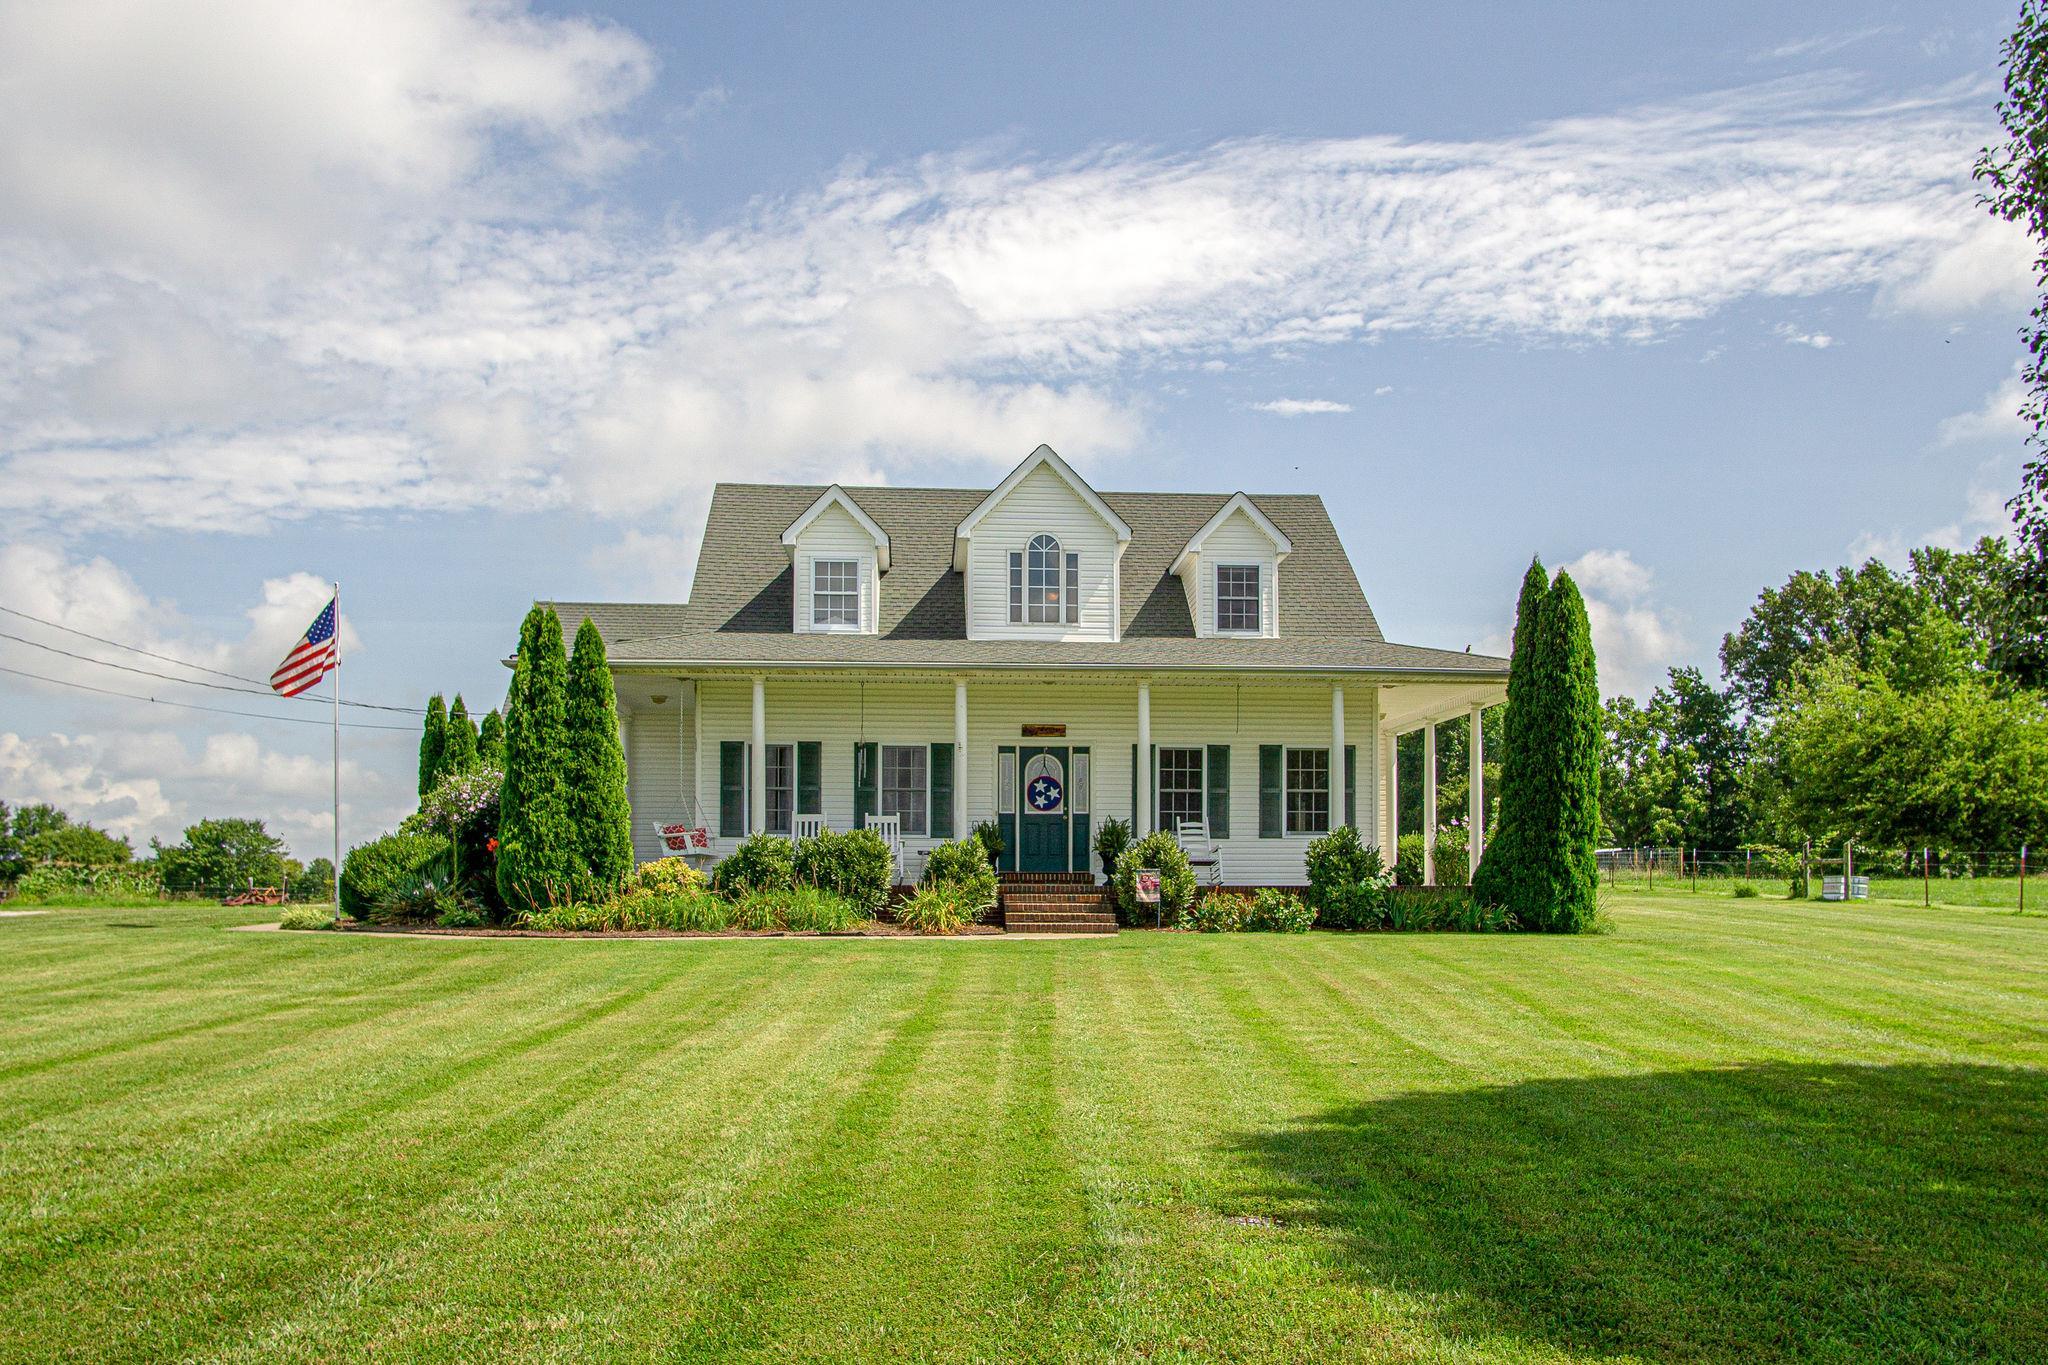 1545 Manley Loop, Dickson, TN 37055 - Dickson, TN real estate listing